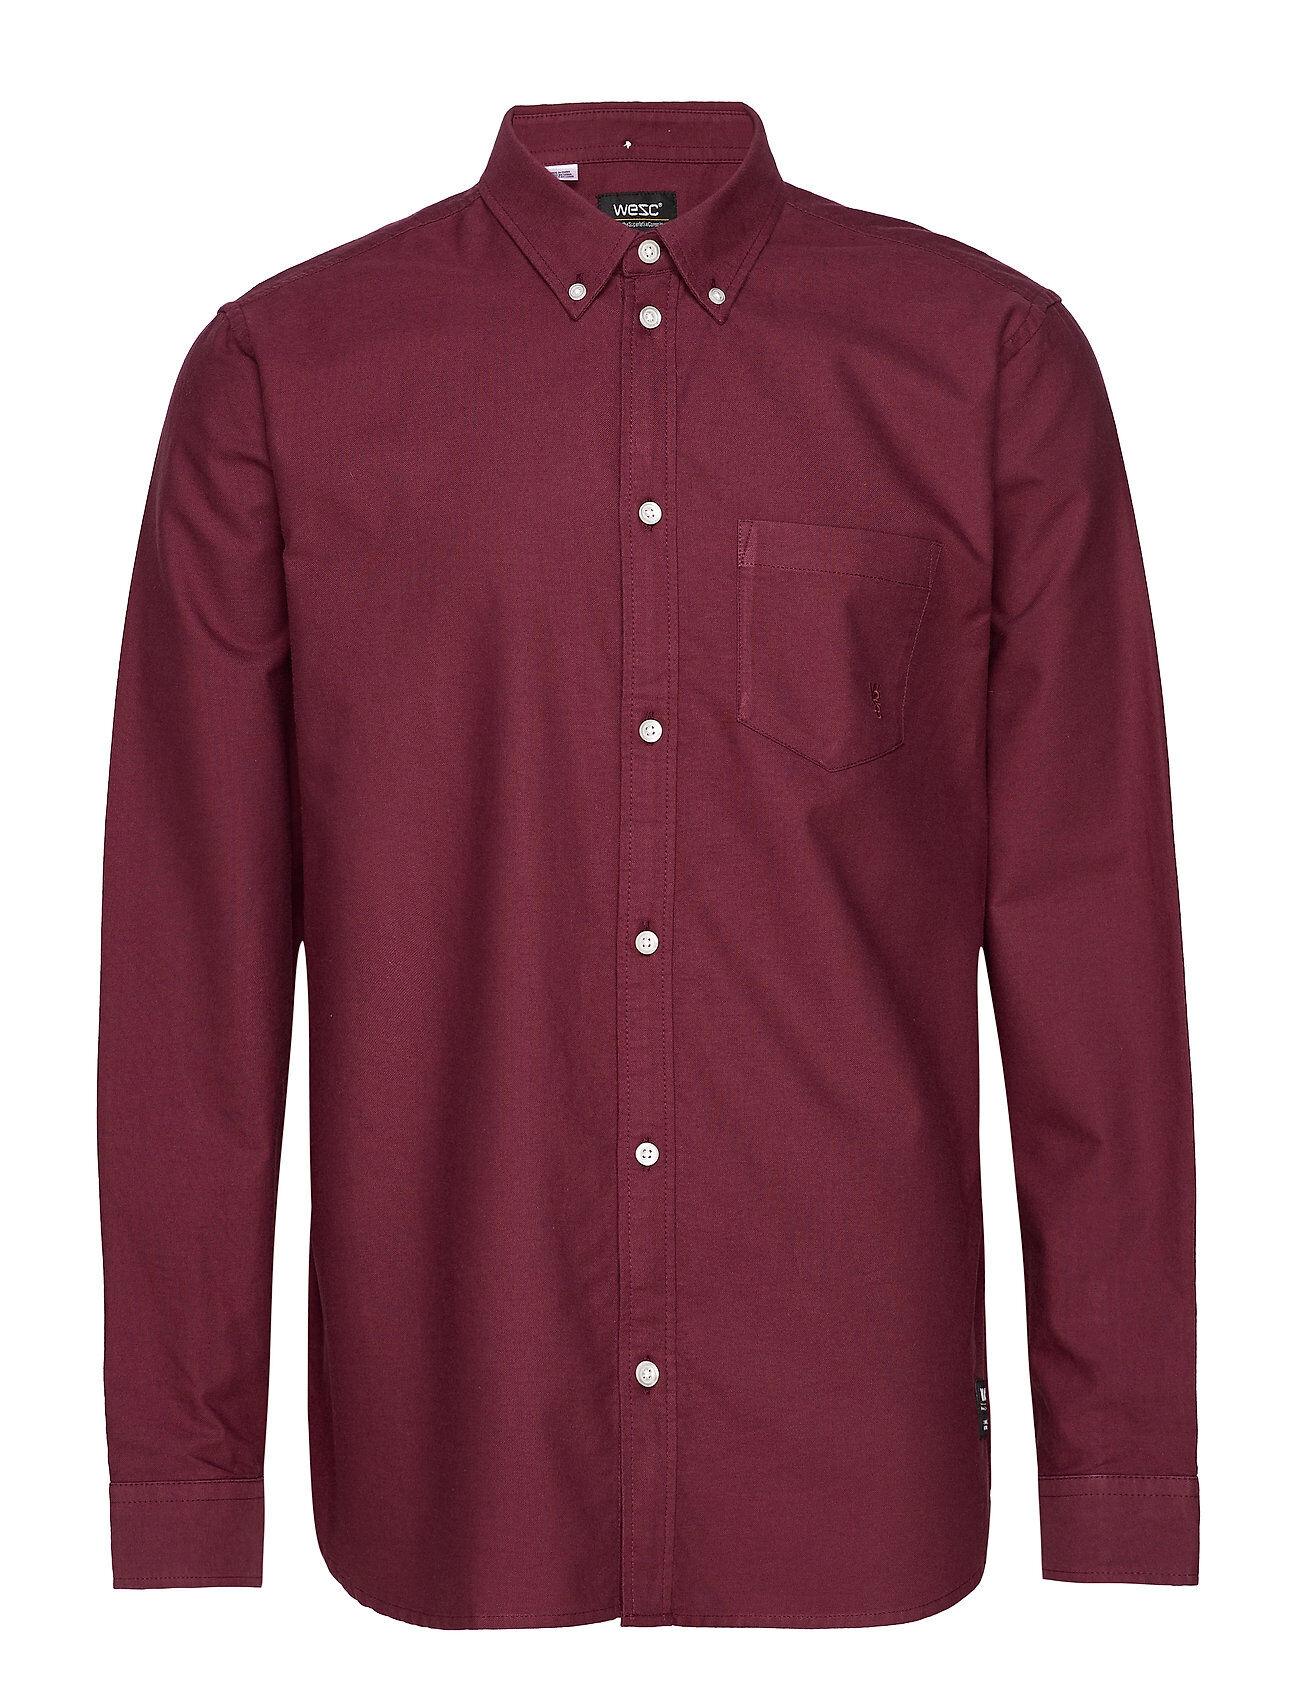 WeSC Oden Shirt Paita Rento Casual Punainen WeSC